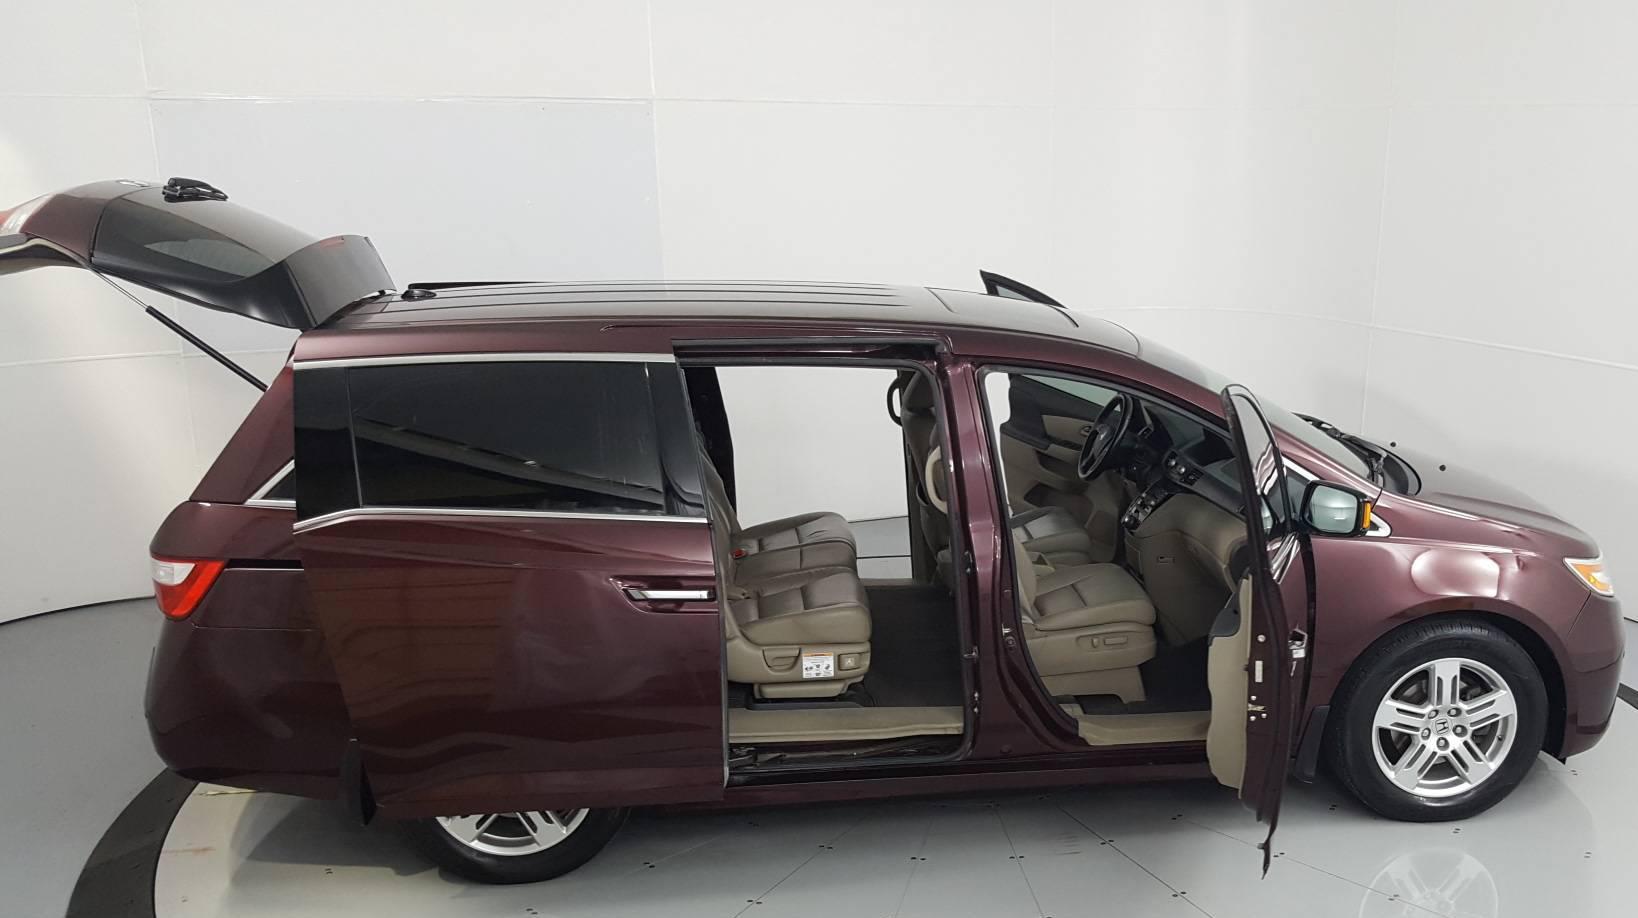 2011 Honda Odyssey Mini-van, Passenger